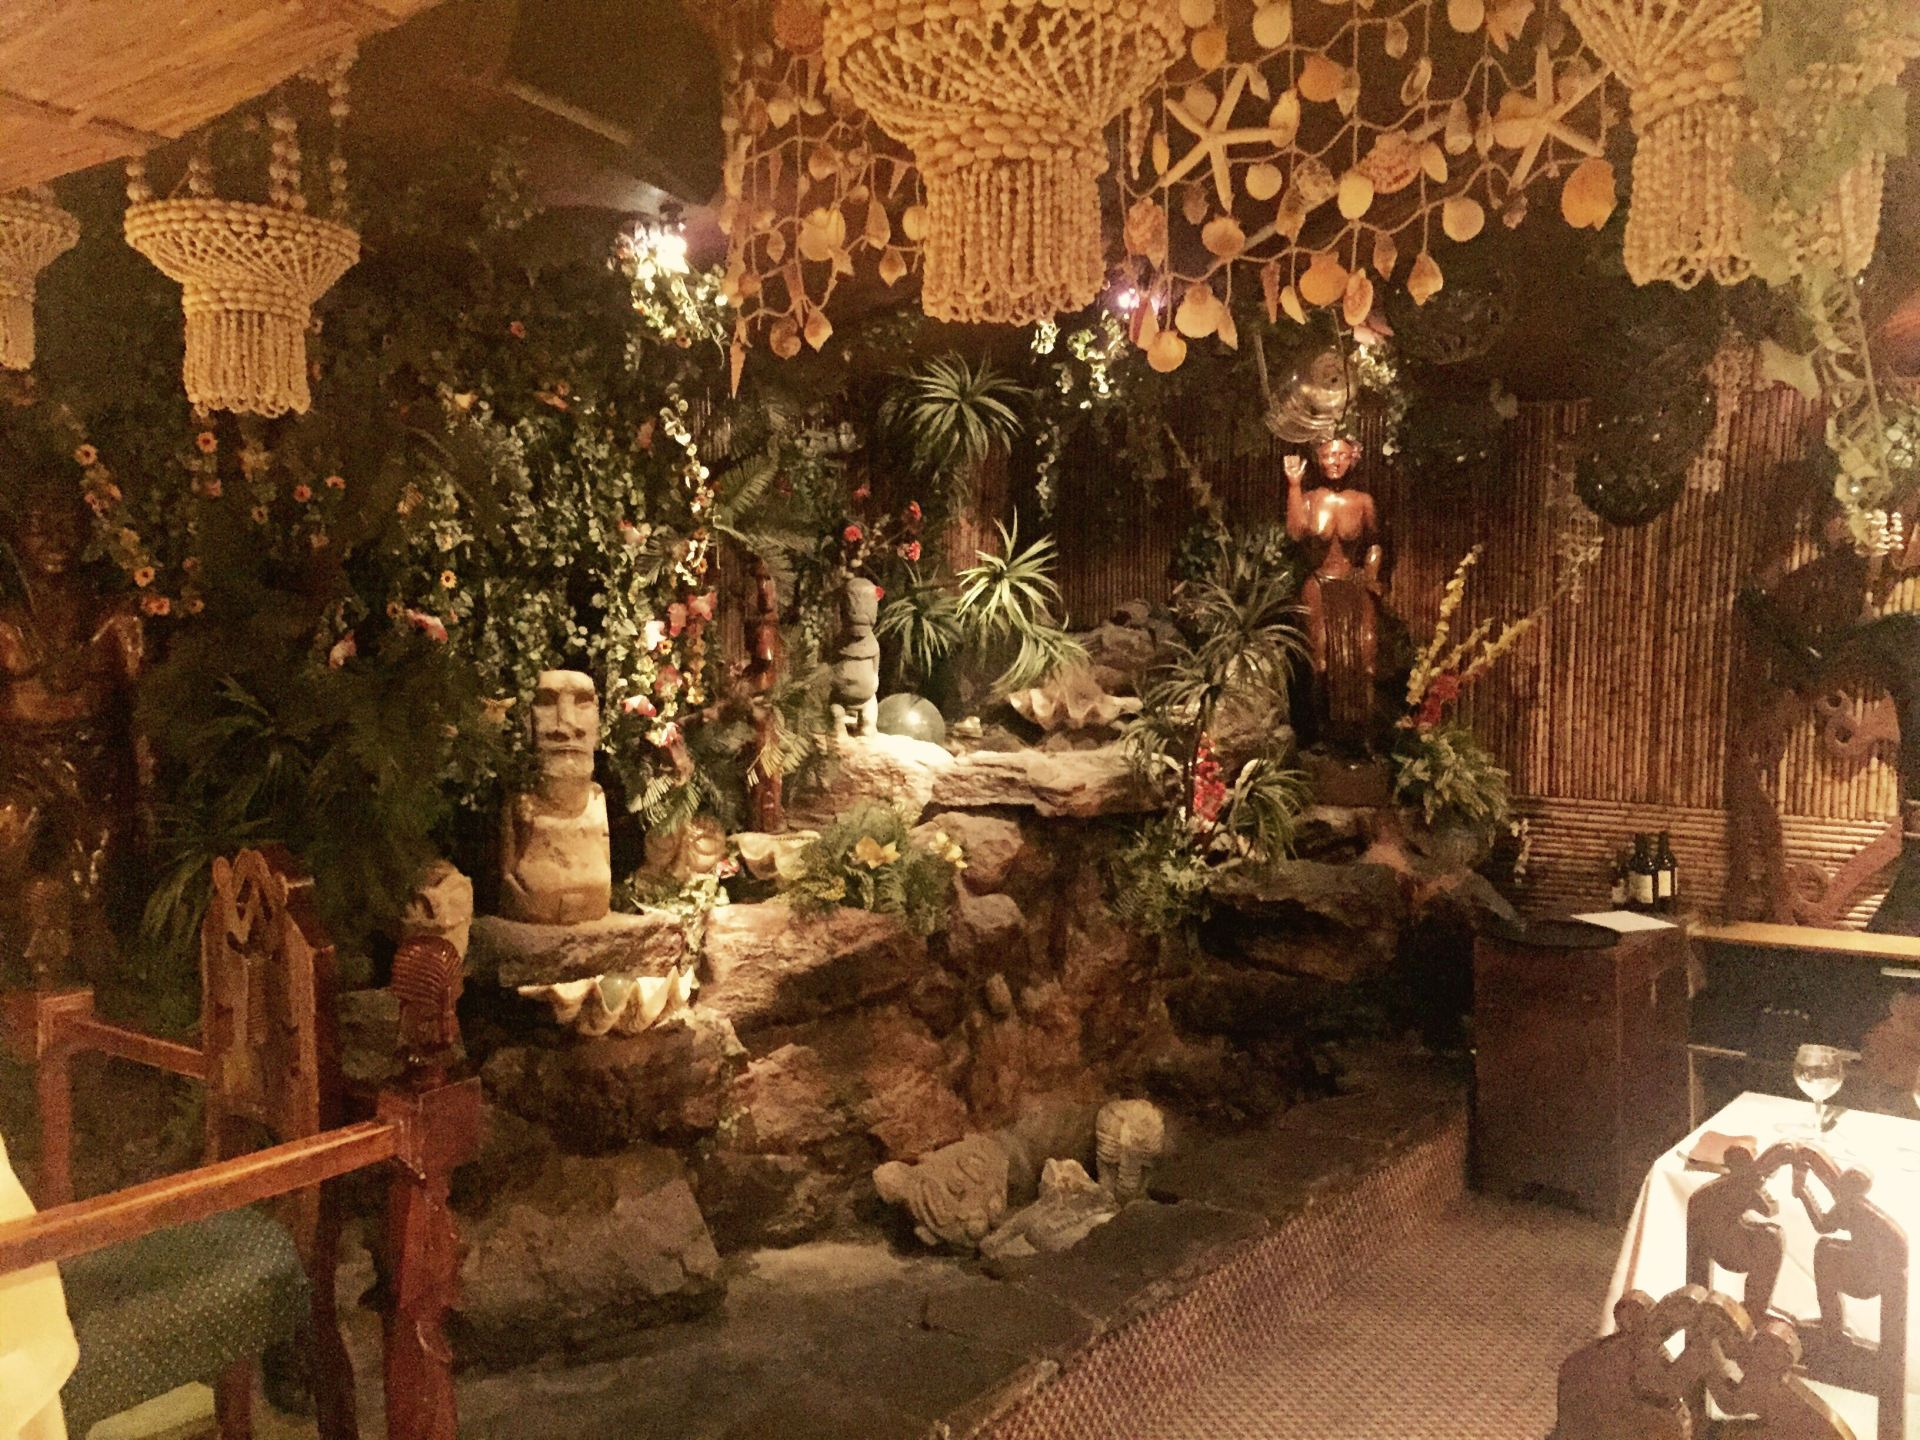 The interior at Bali Hai in Santiago, Chile